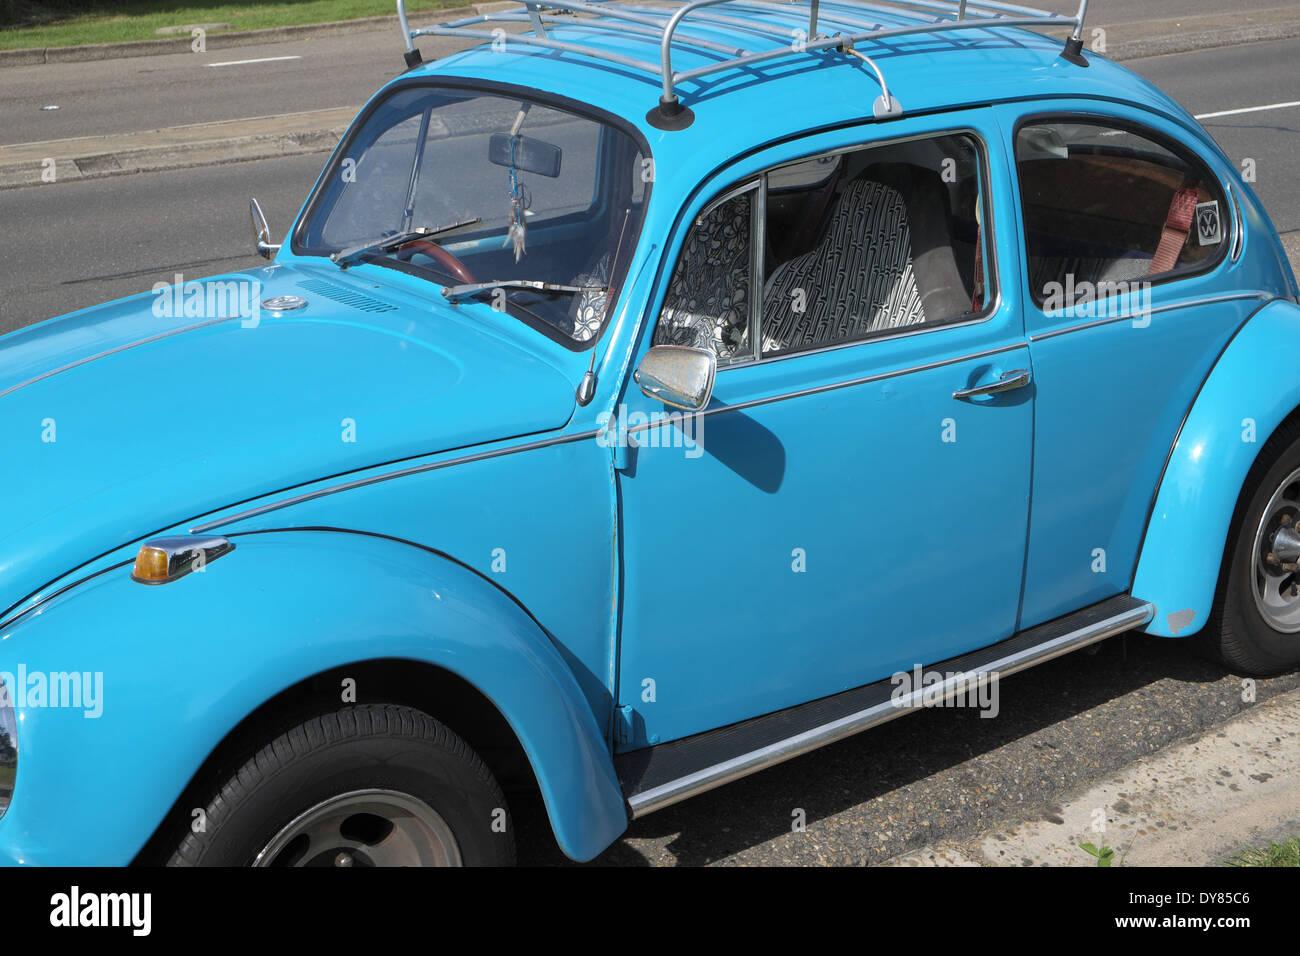 classic vw beetle on pittwater road,sydney,australia - Stock Image